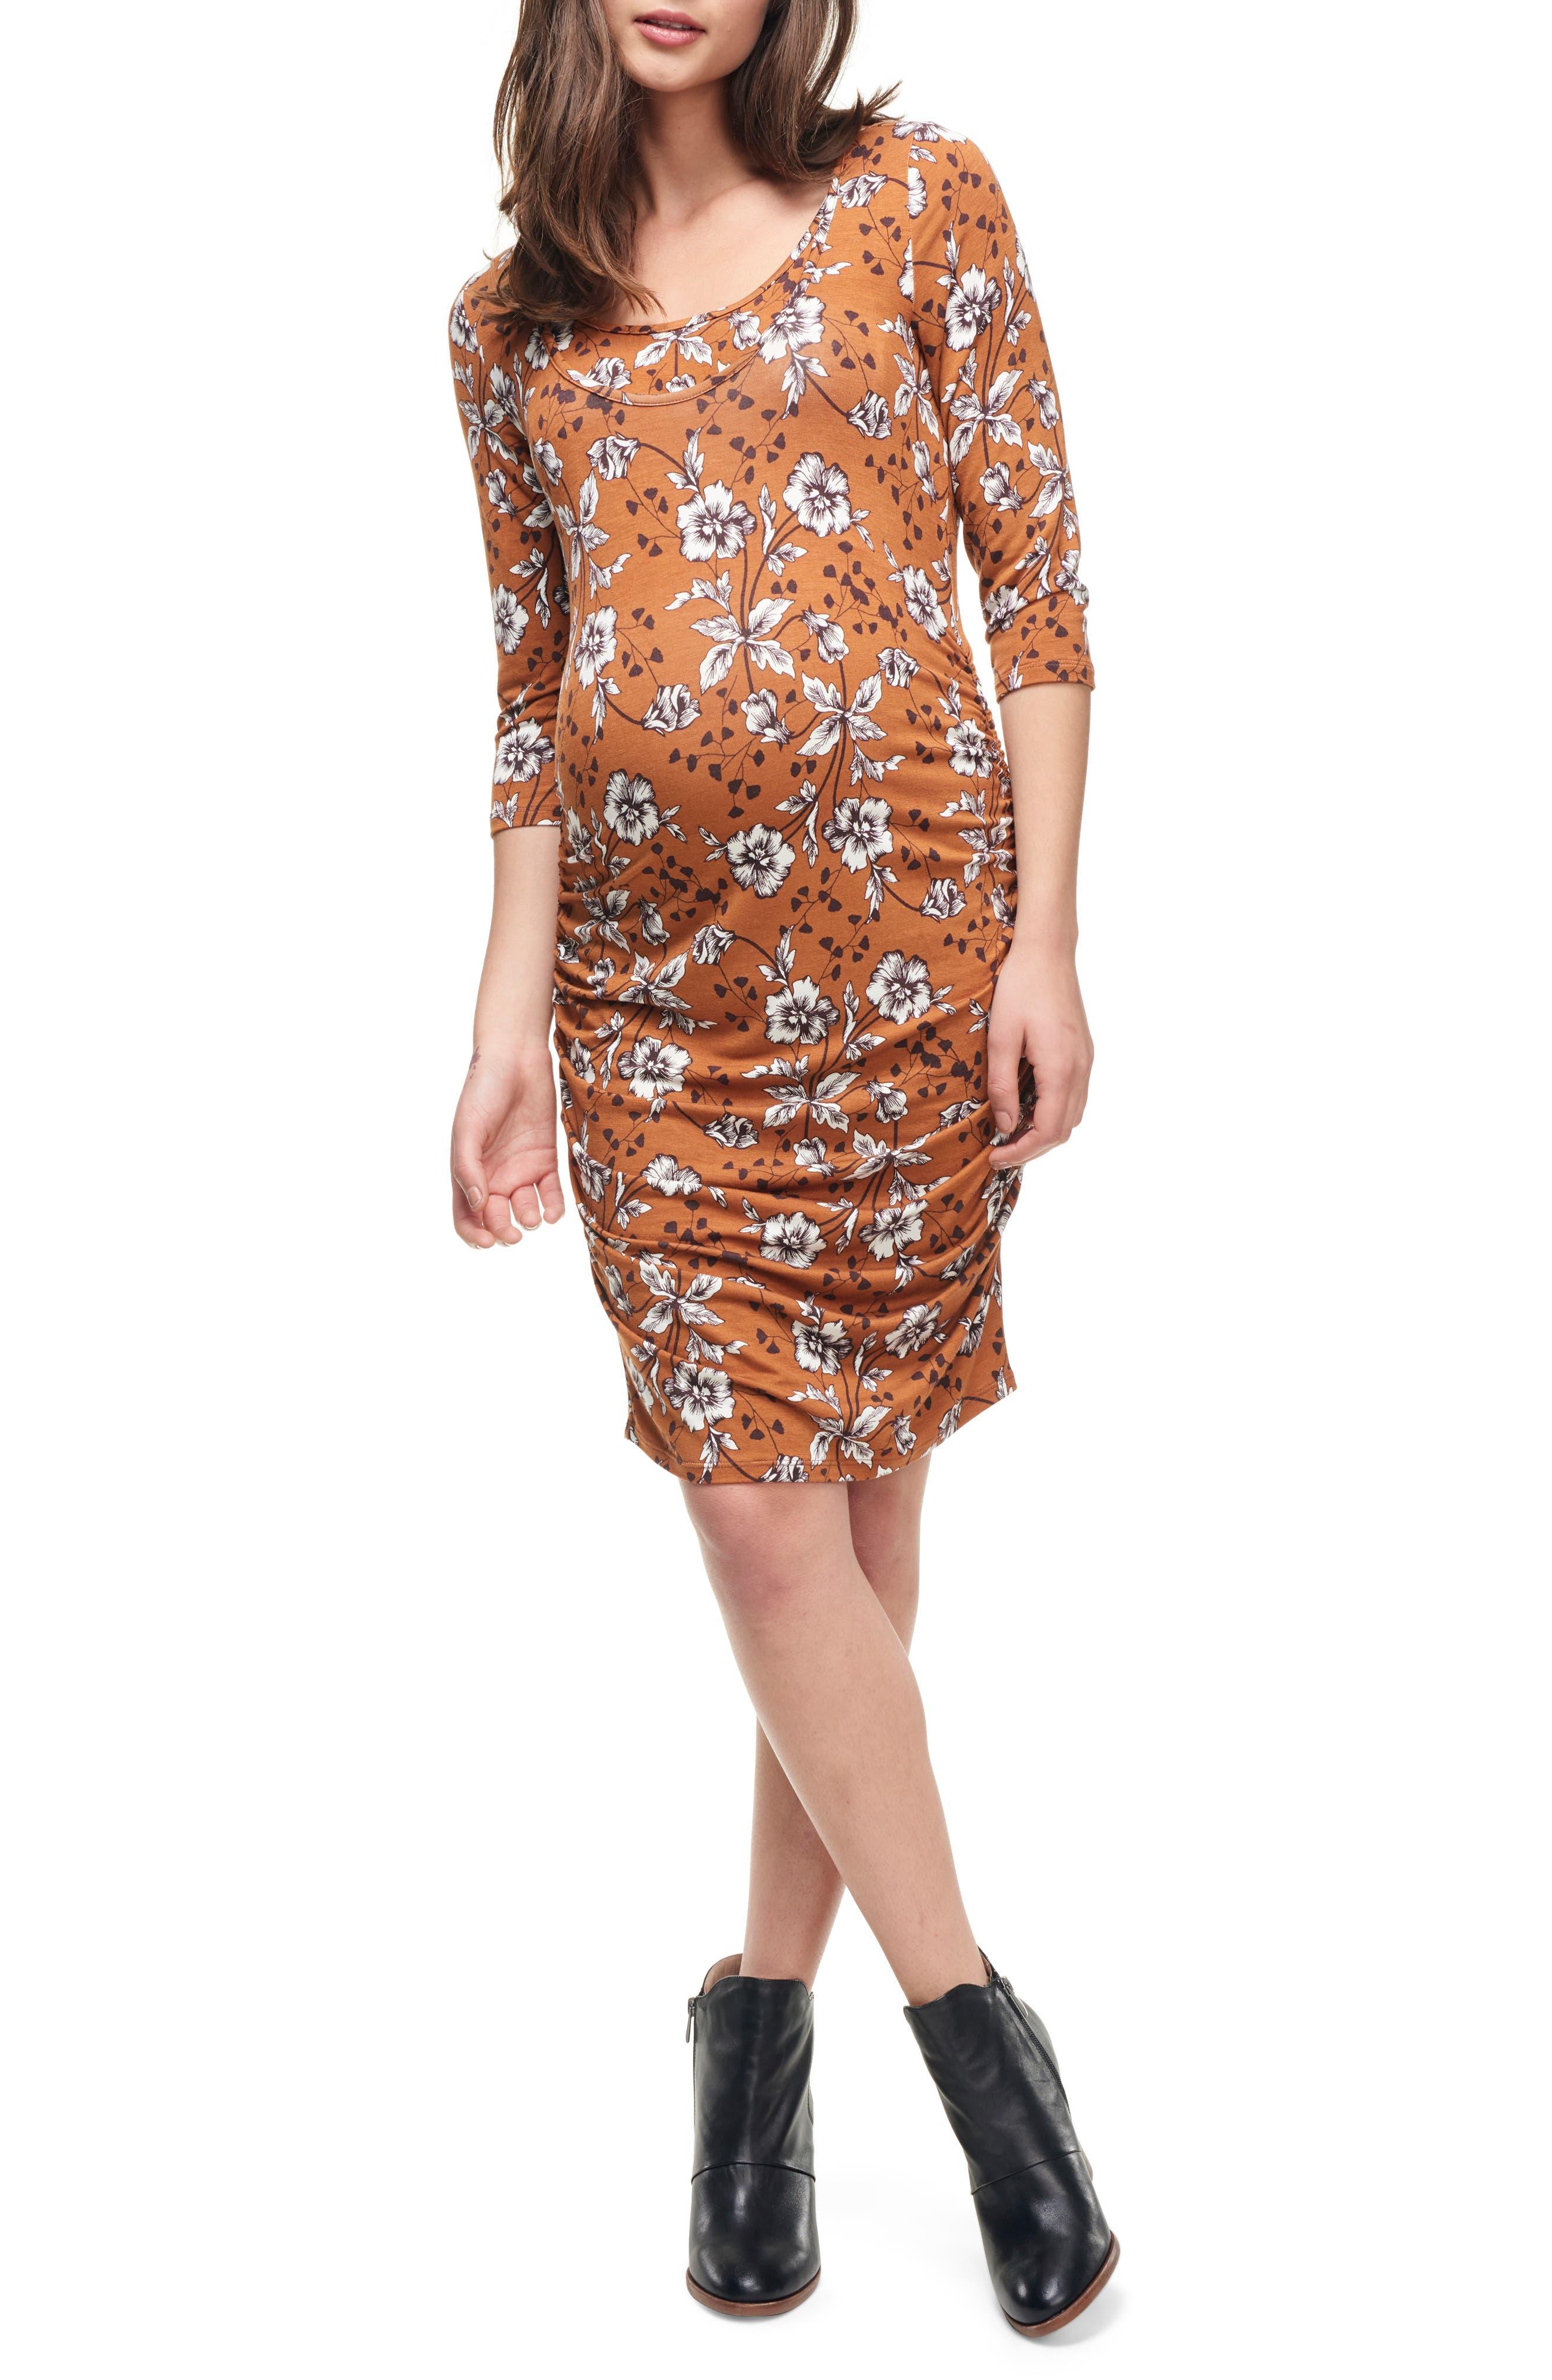 MATERNAL AMERICA Ruched Maternity Dress, Main, color, SAFFRON FLORAL